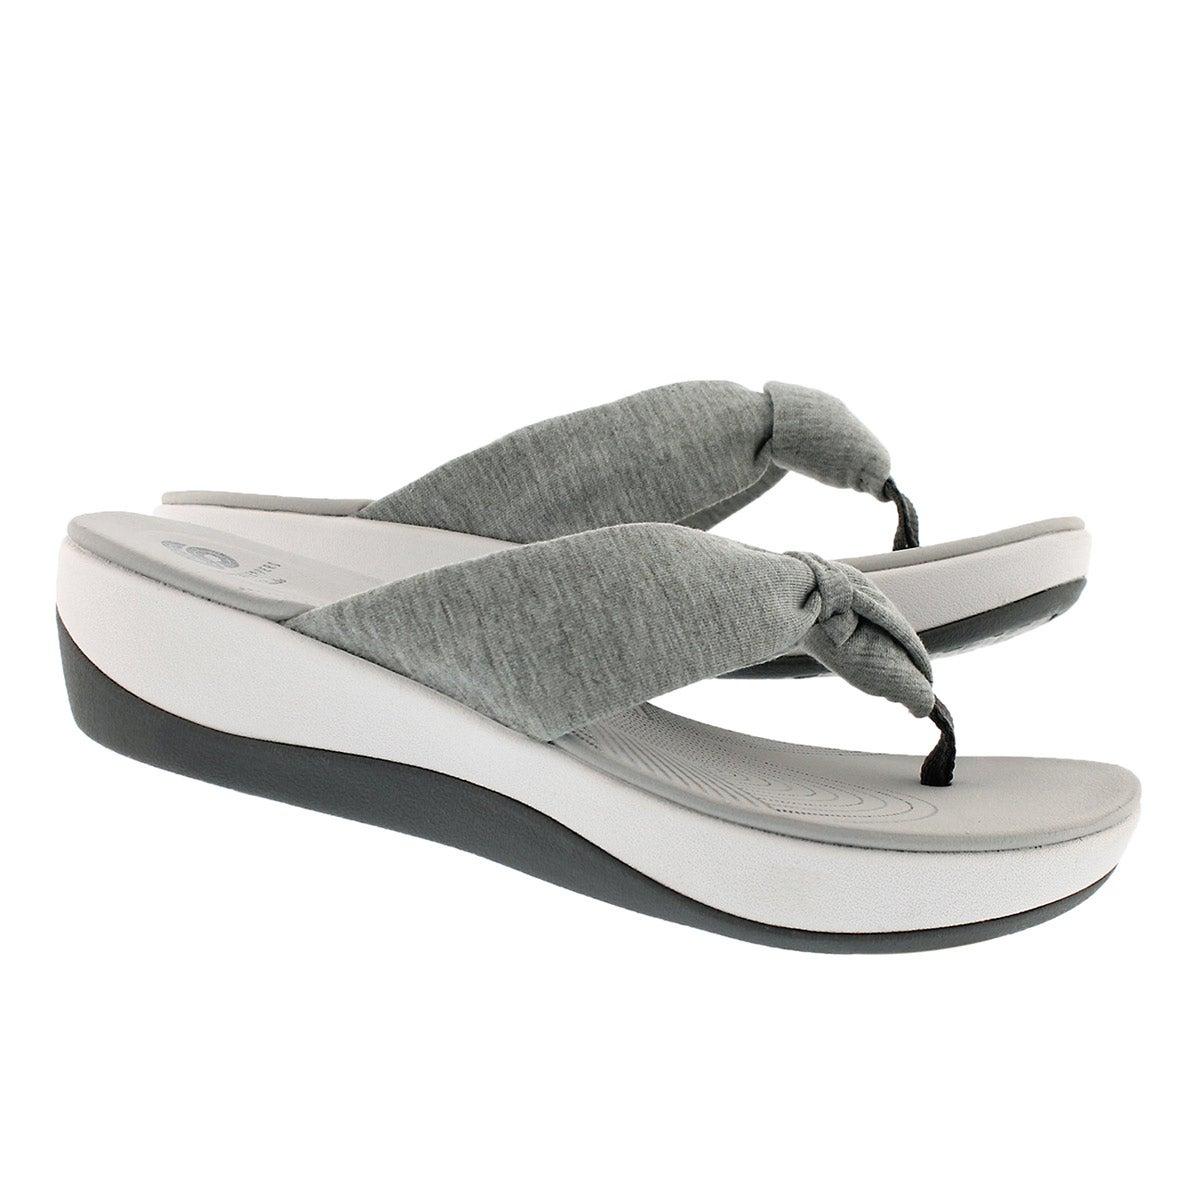 Women's Arla Glison Thong Wedge Sandal - Grey